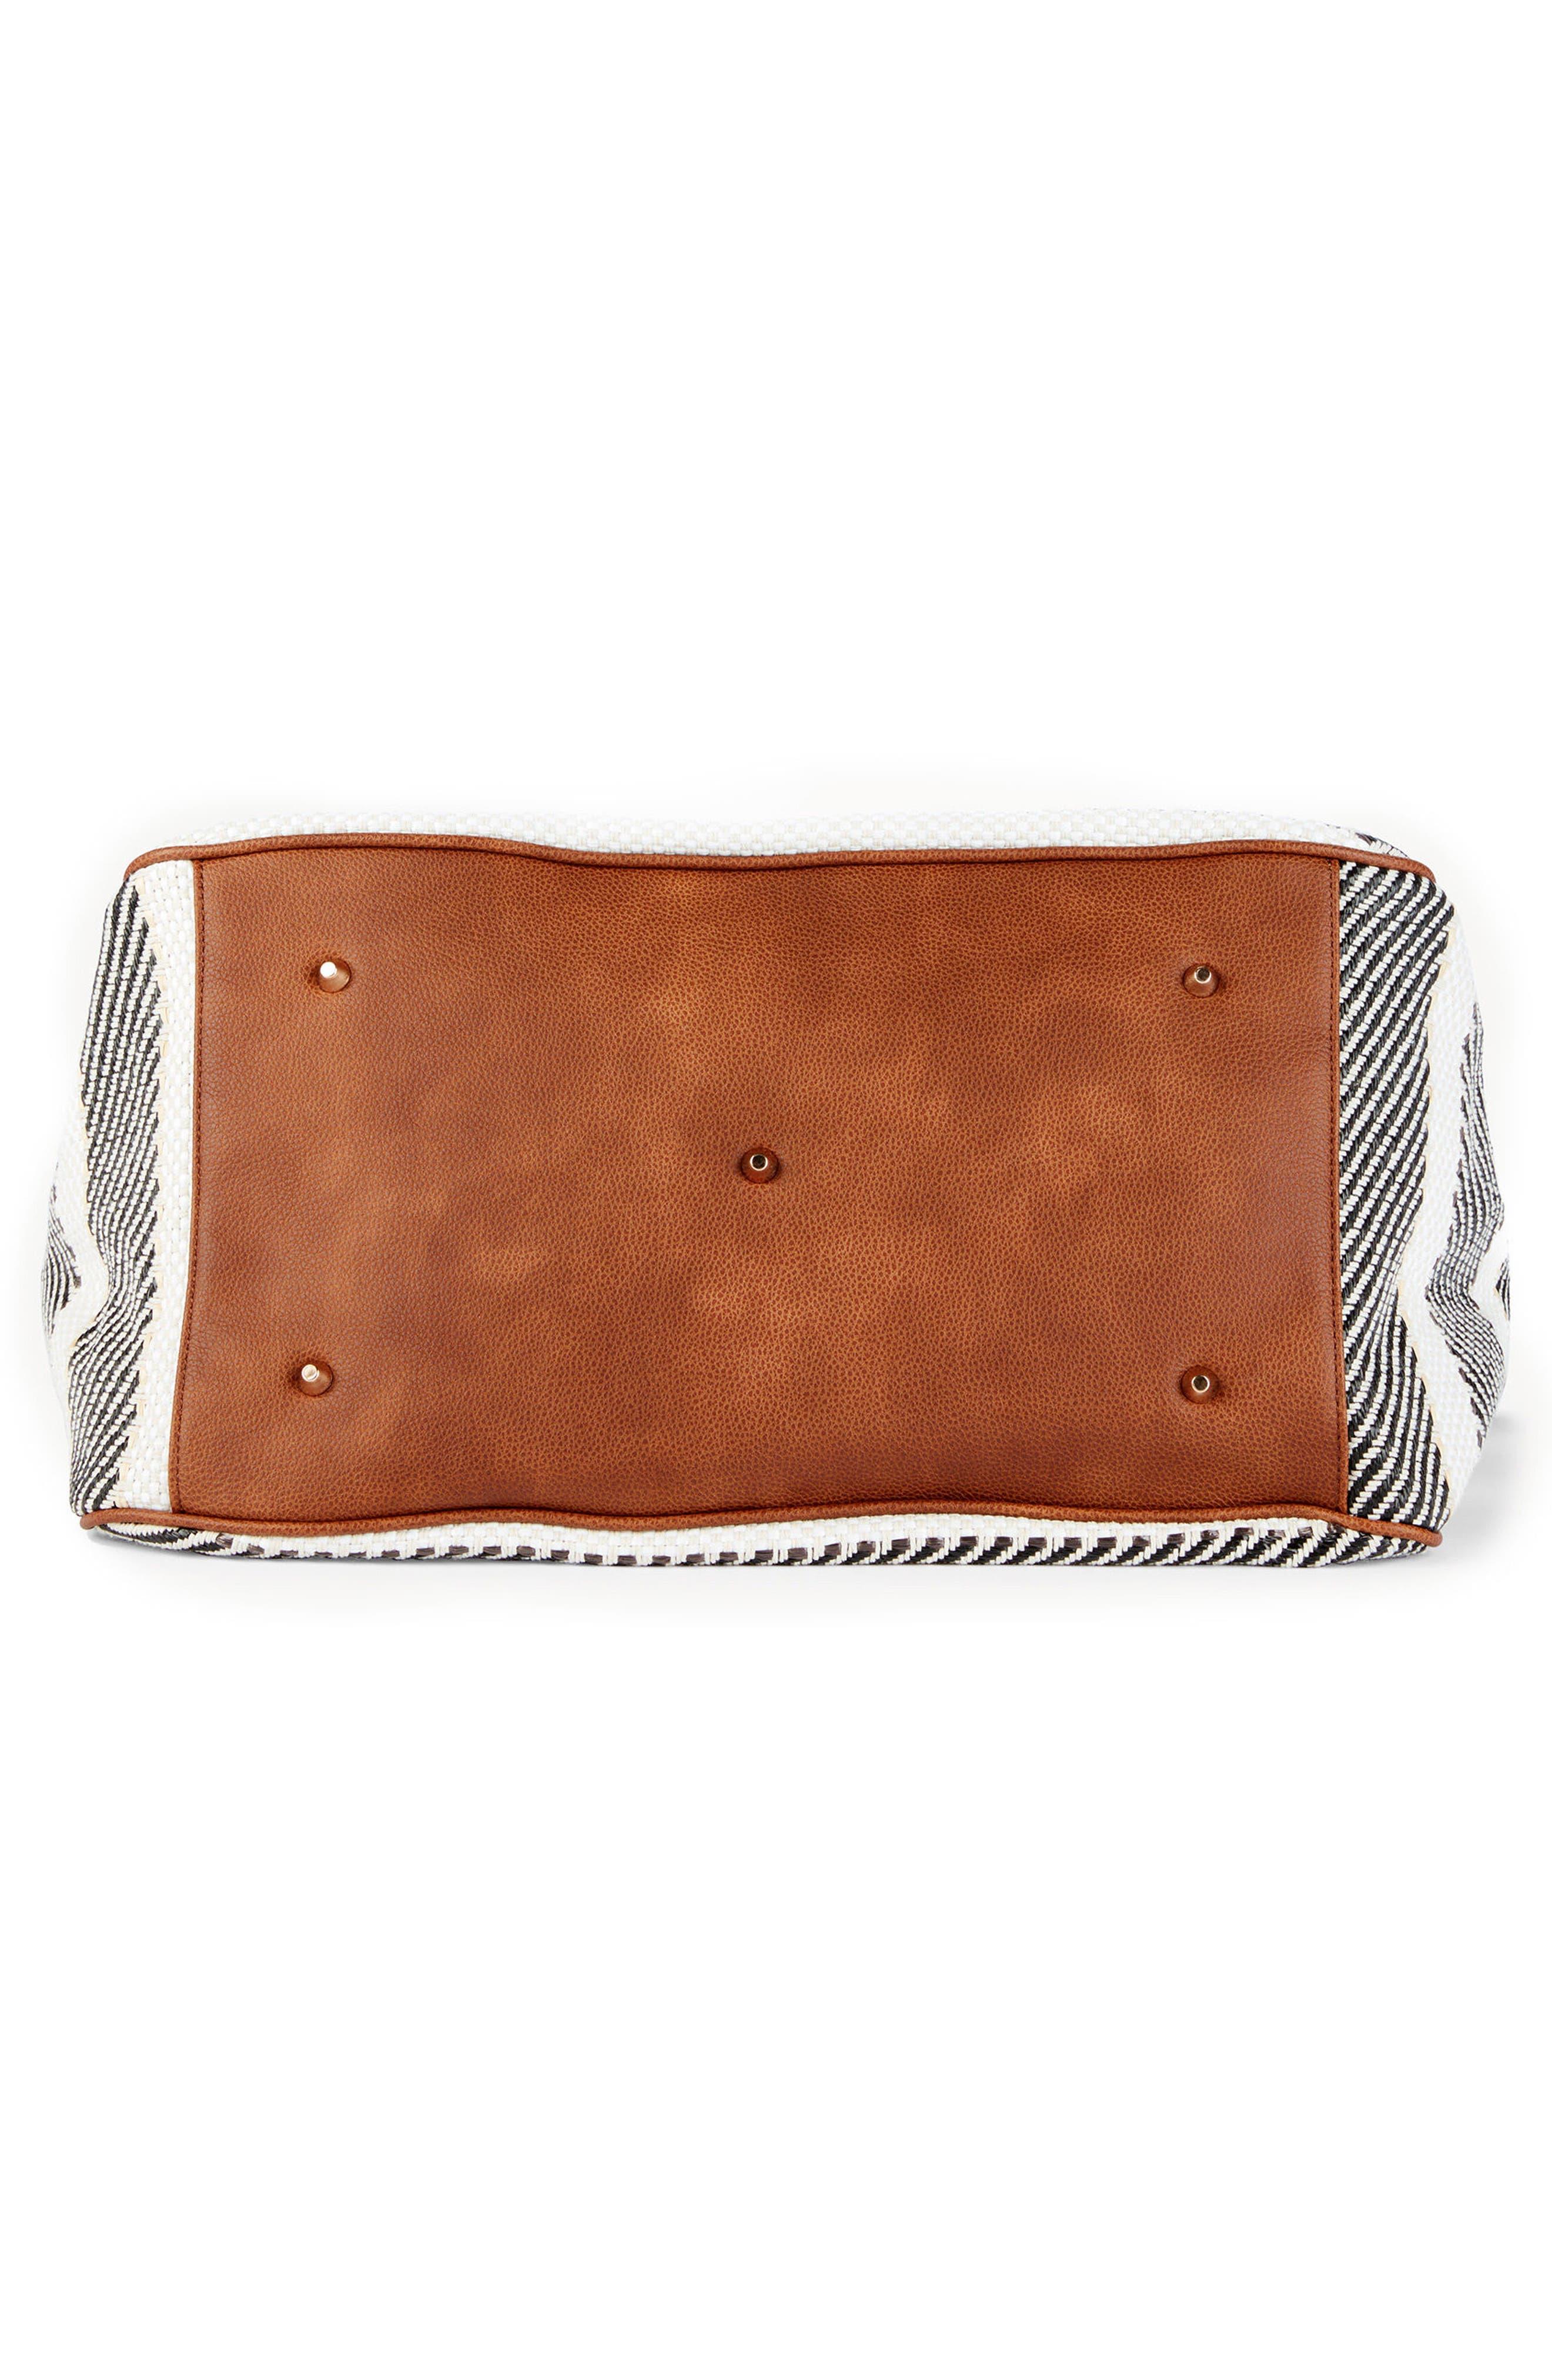 Stripe Woven Weekend Bag,                             Alternate thumbnail 6, color,                             Black/ Cream Combo